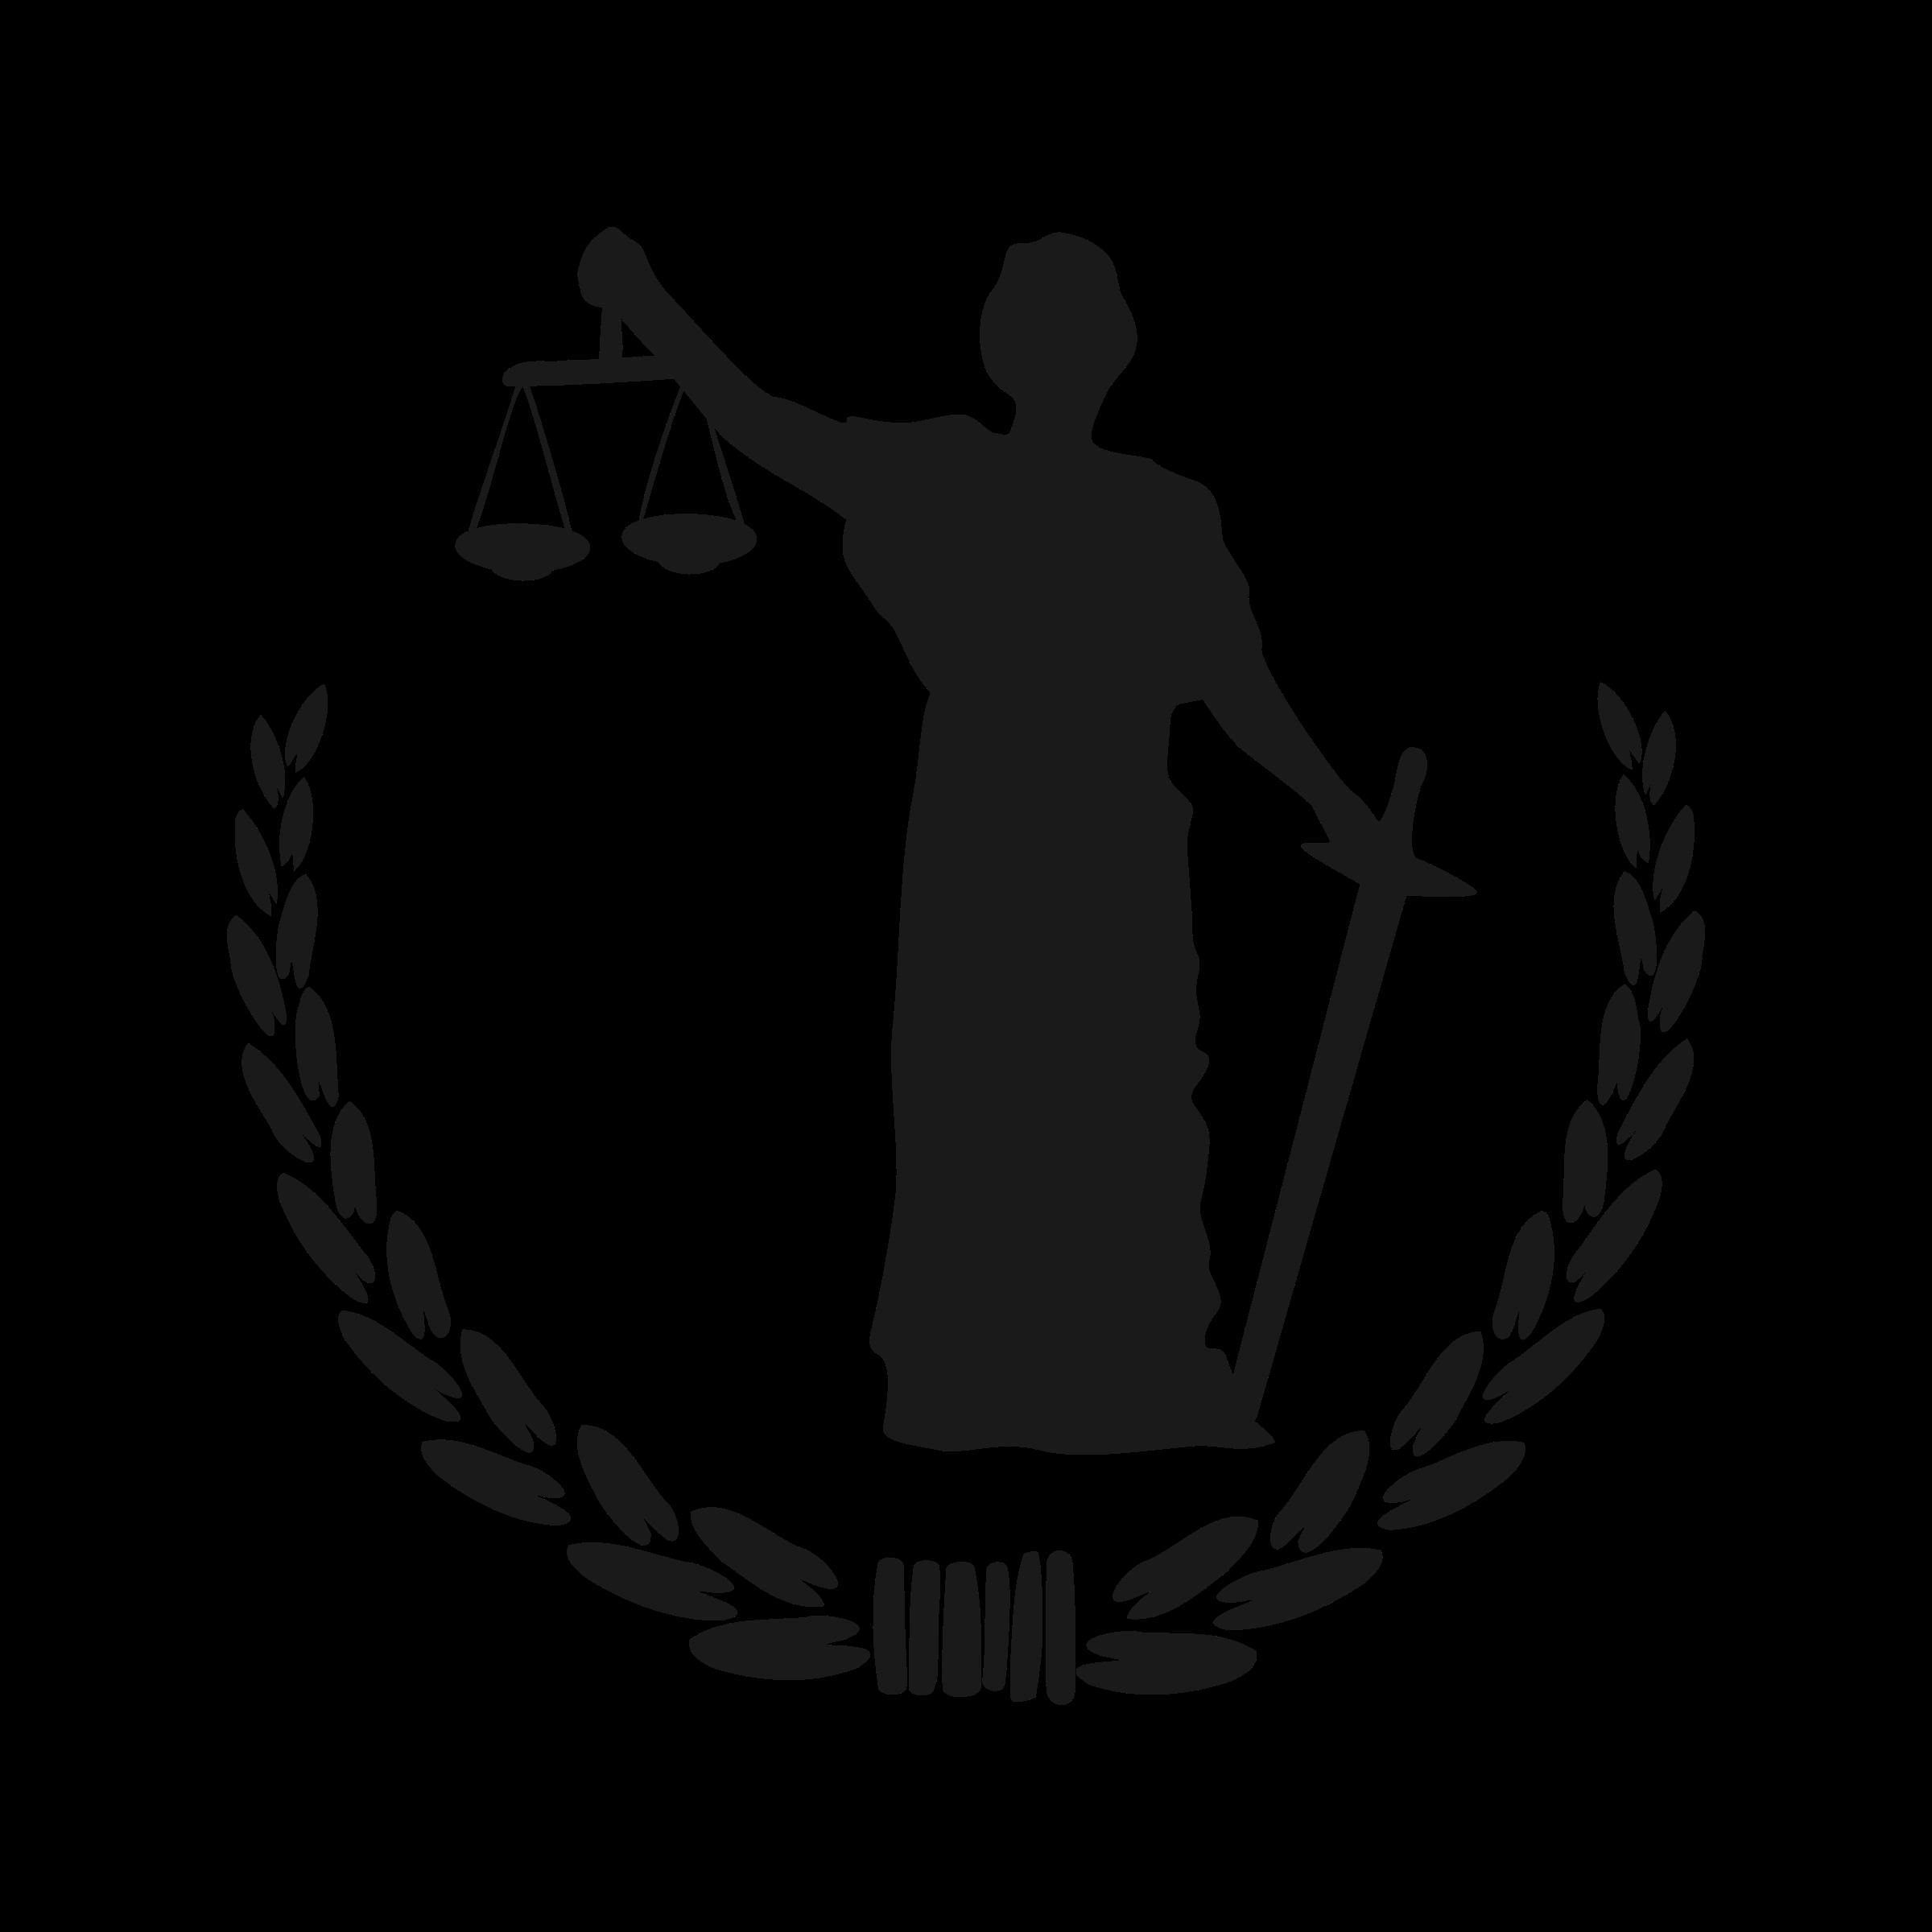 Justice clipart clipartall 6-Justice clipart clipartall 6-15